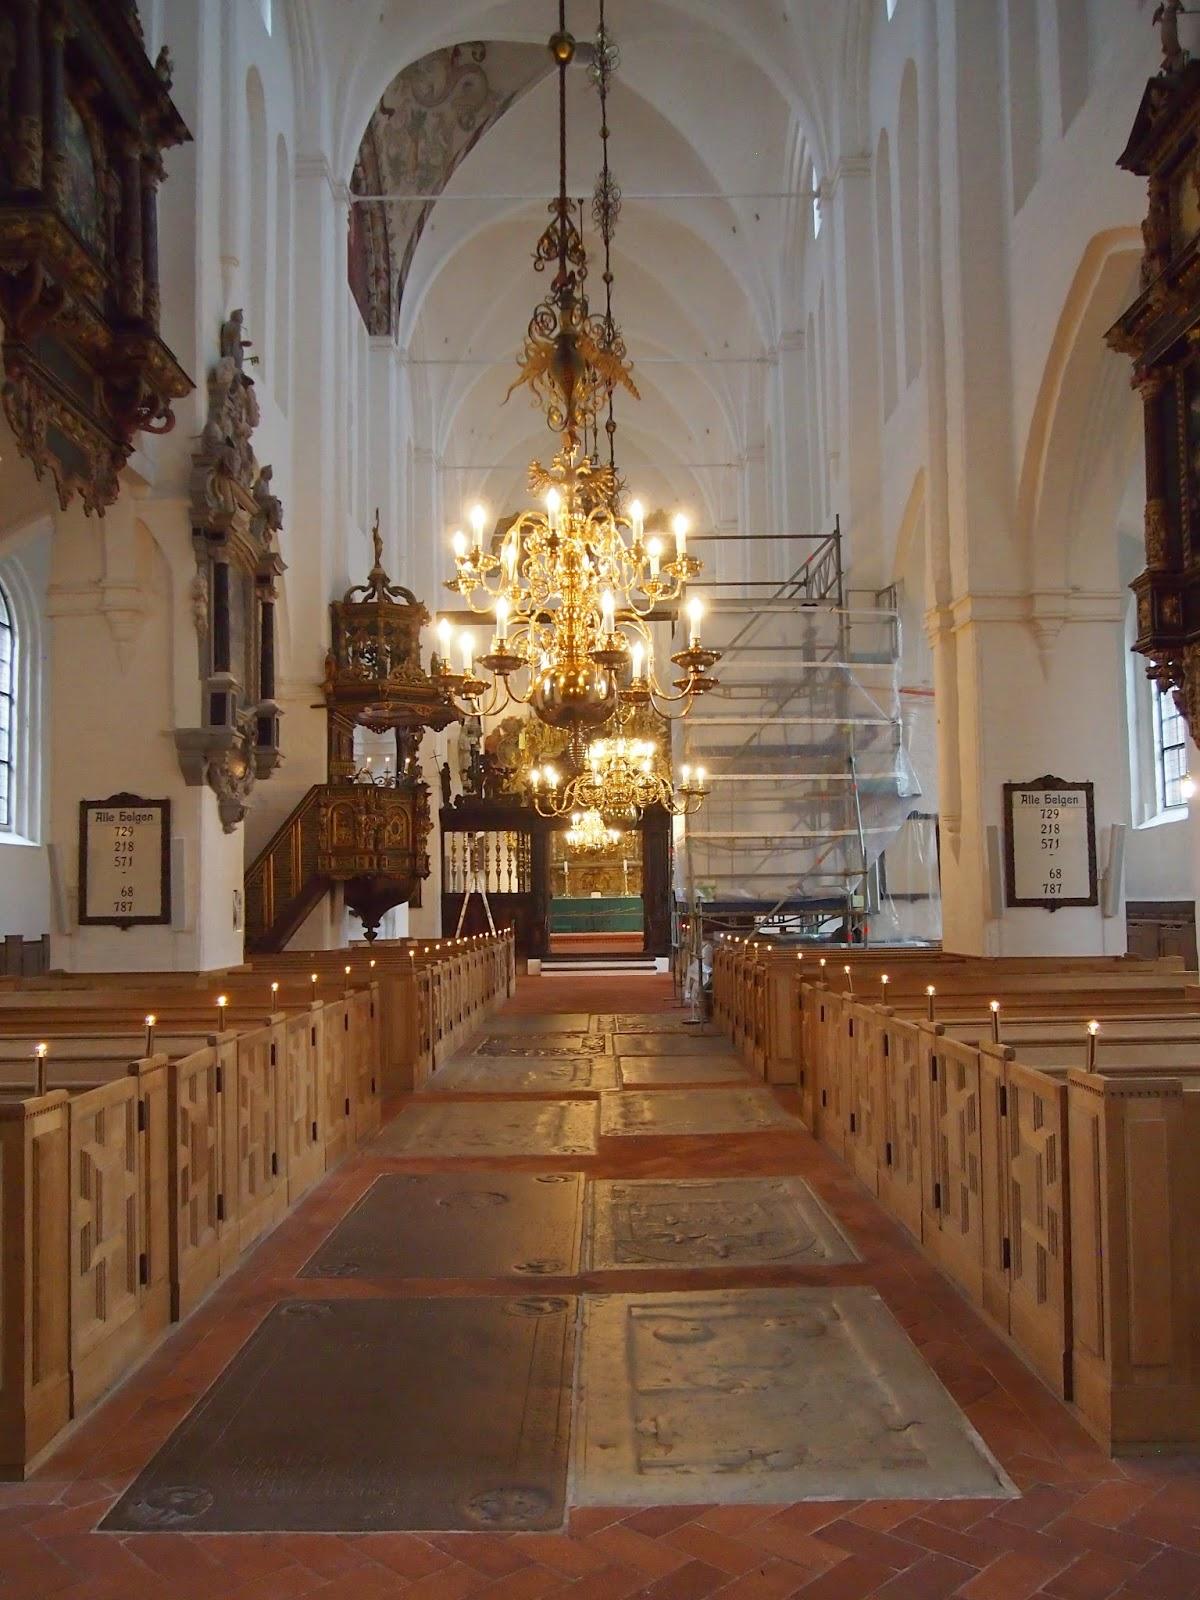 inside of St. Olaf's church in Helsingor